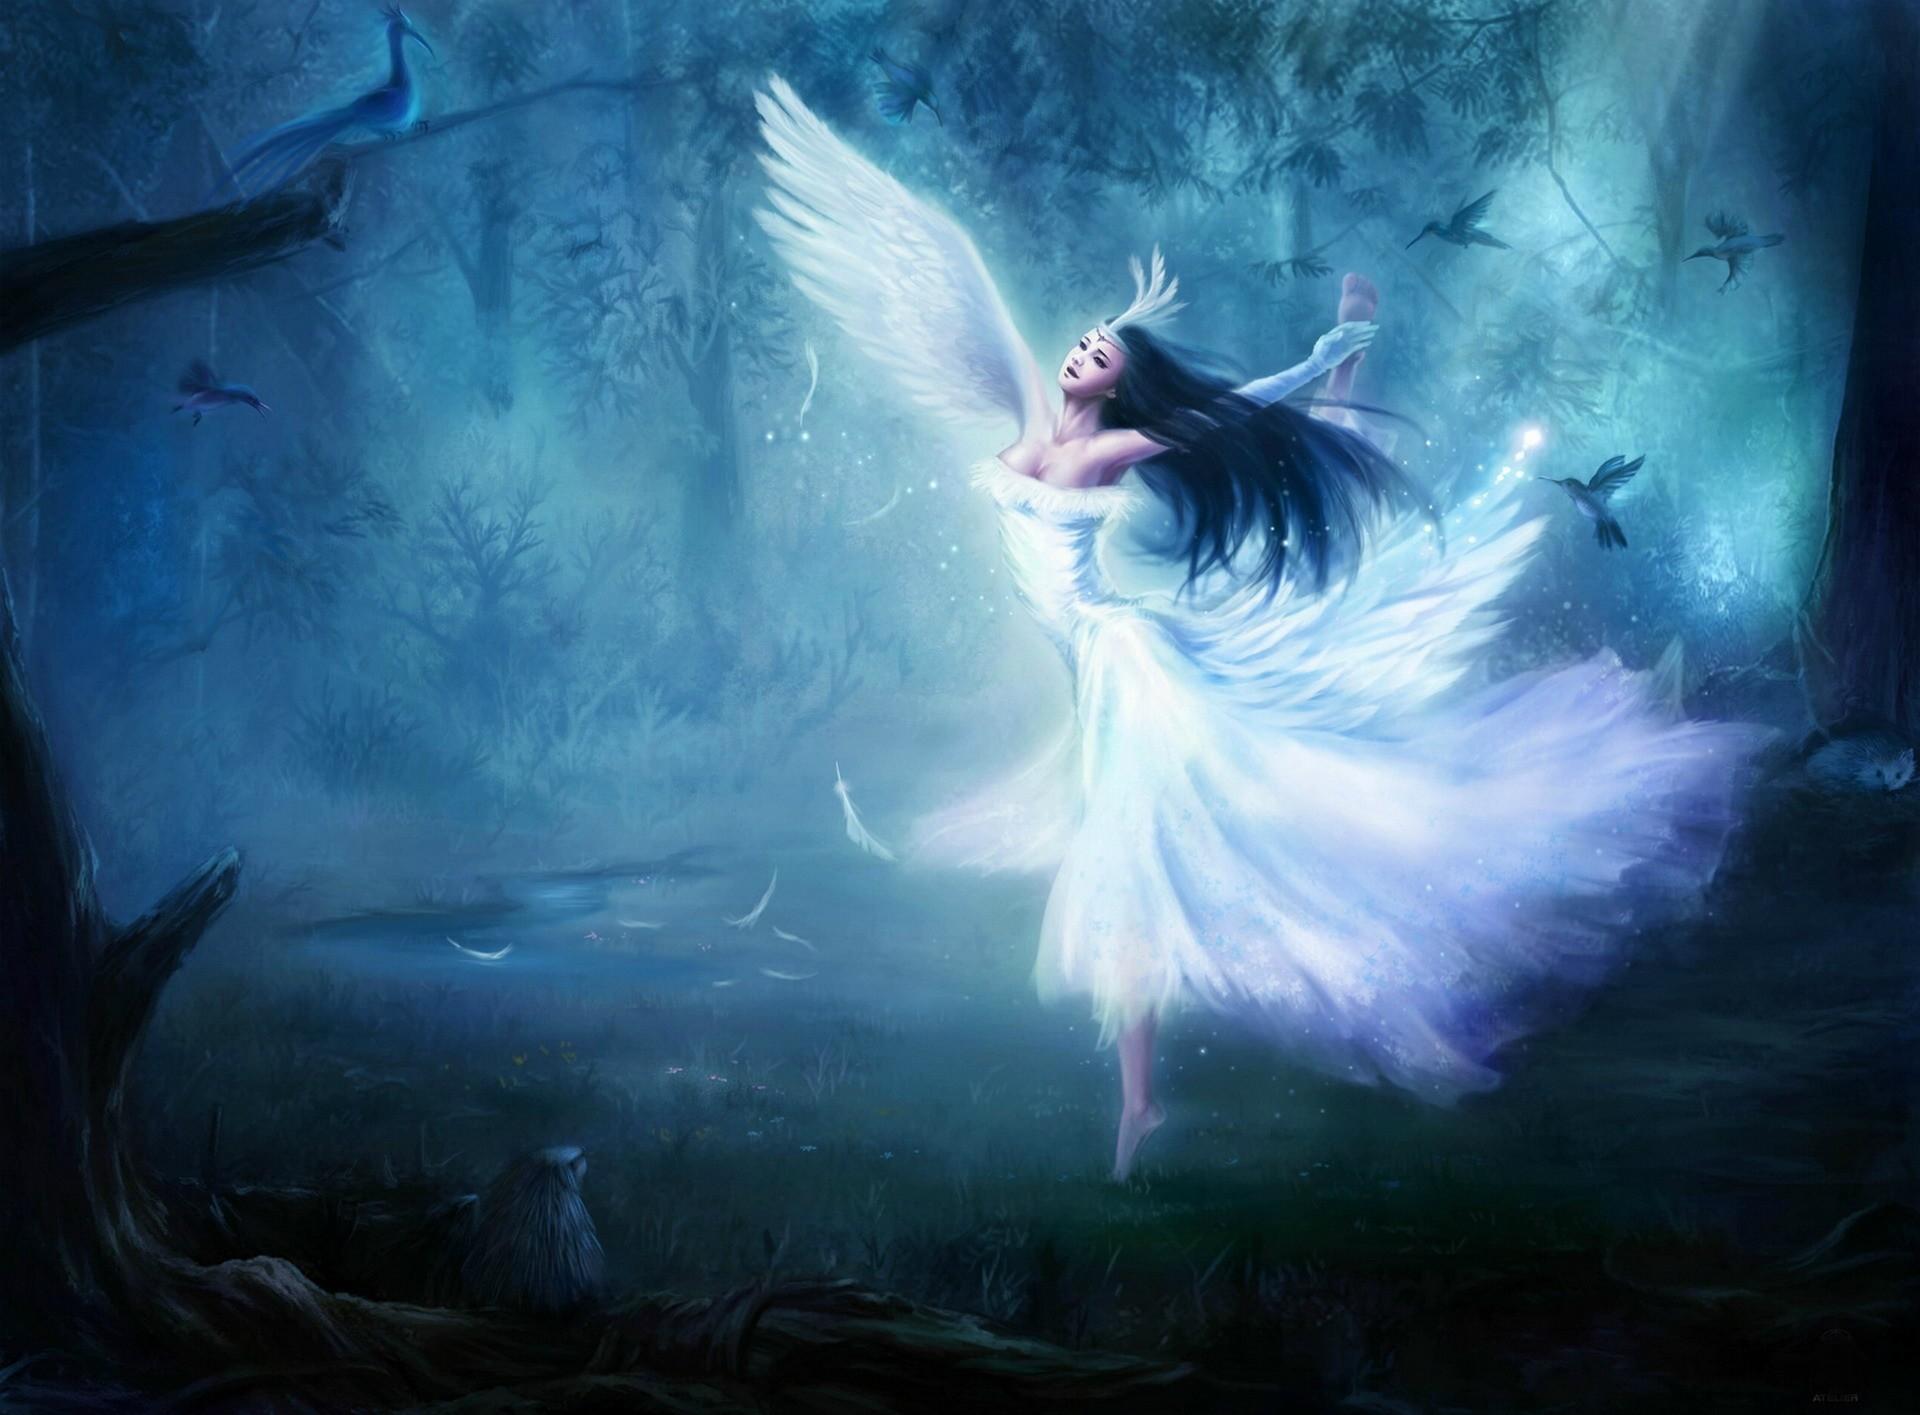 Res: 1920x1415, Fairy Wallpaper 41463